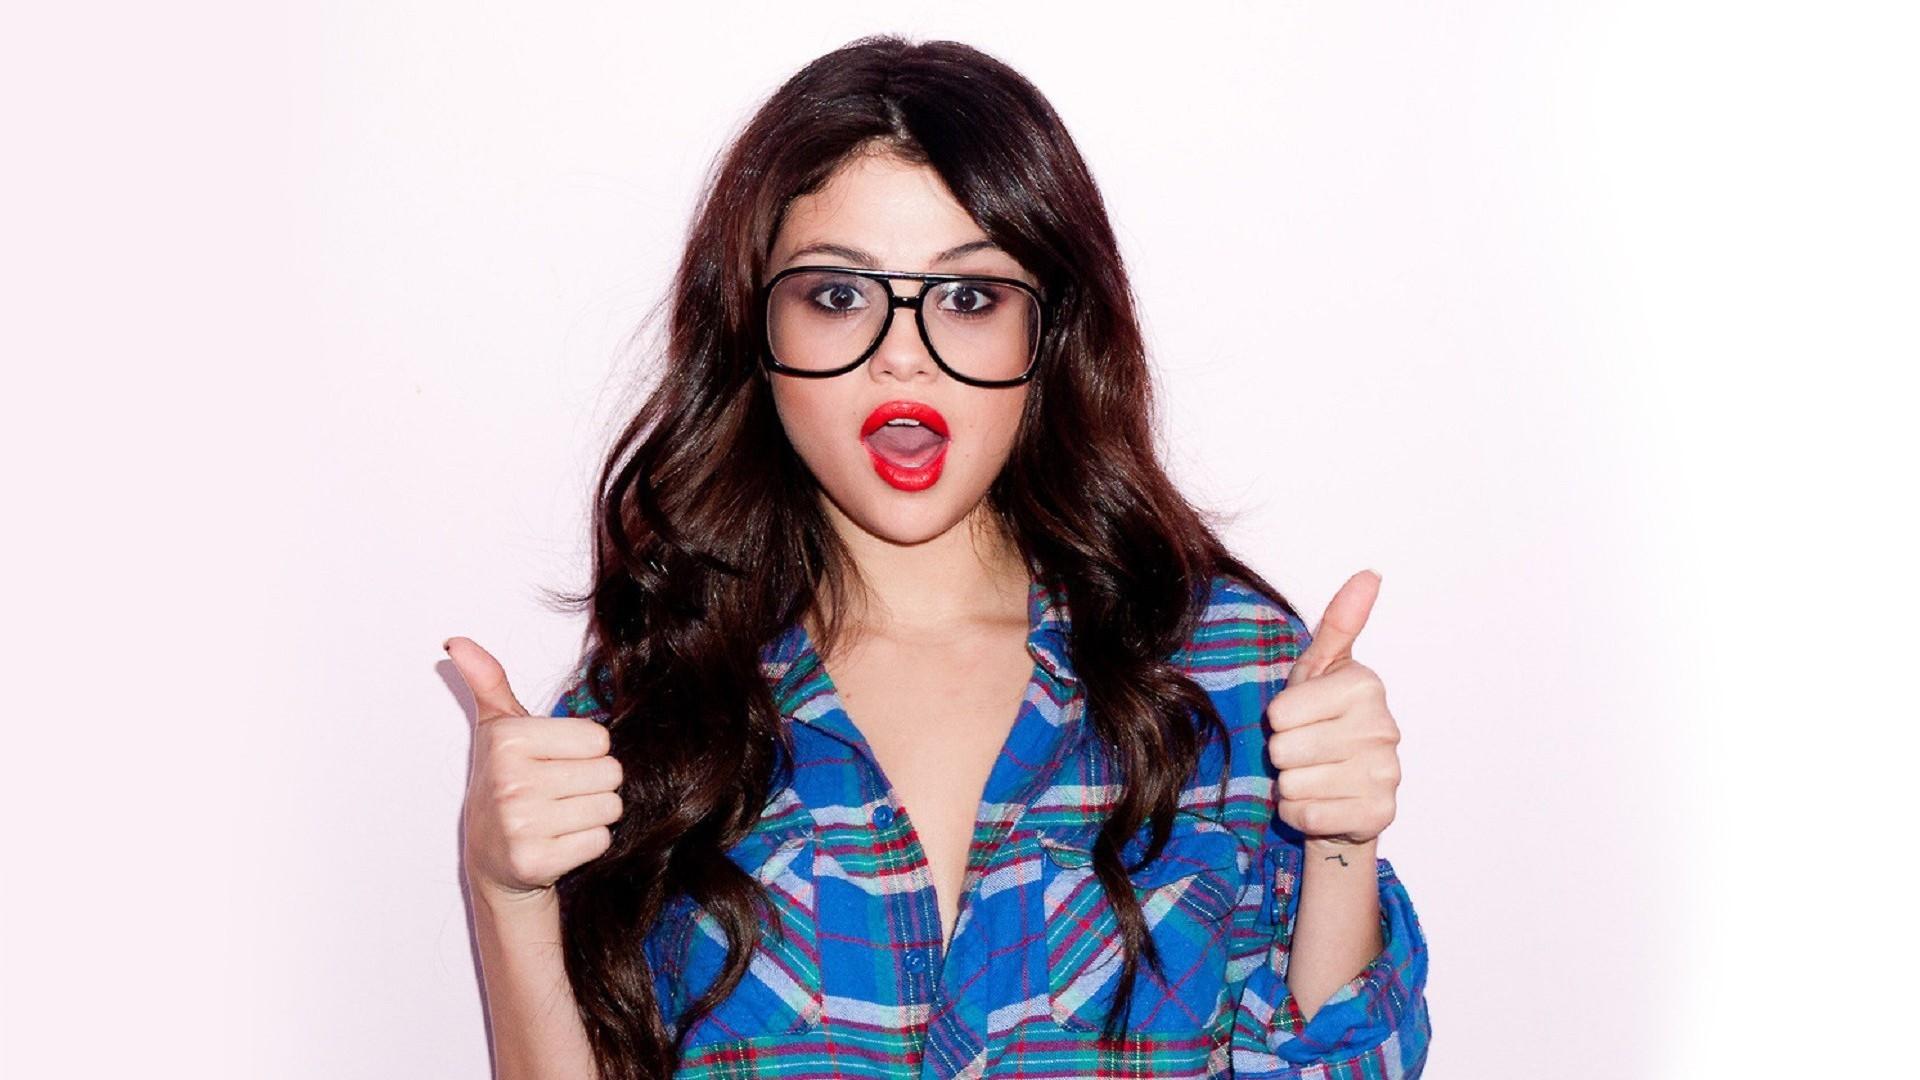 Ideas About Selena Gomez Hd Wallpapers On Pinterest 1920x1080